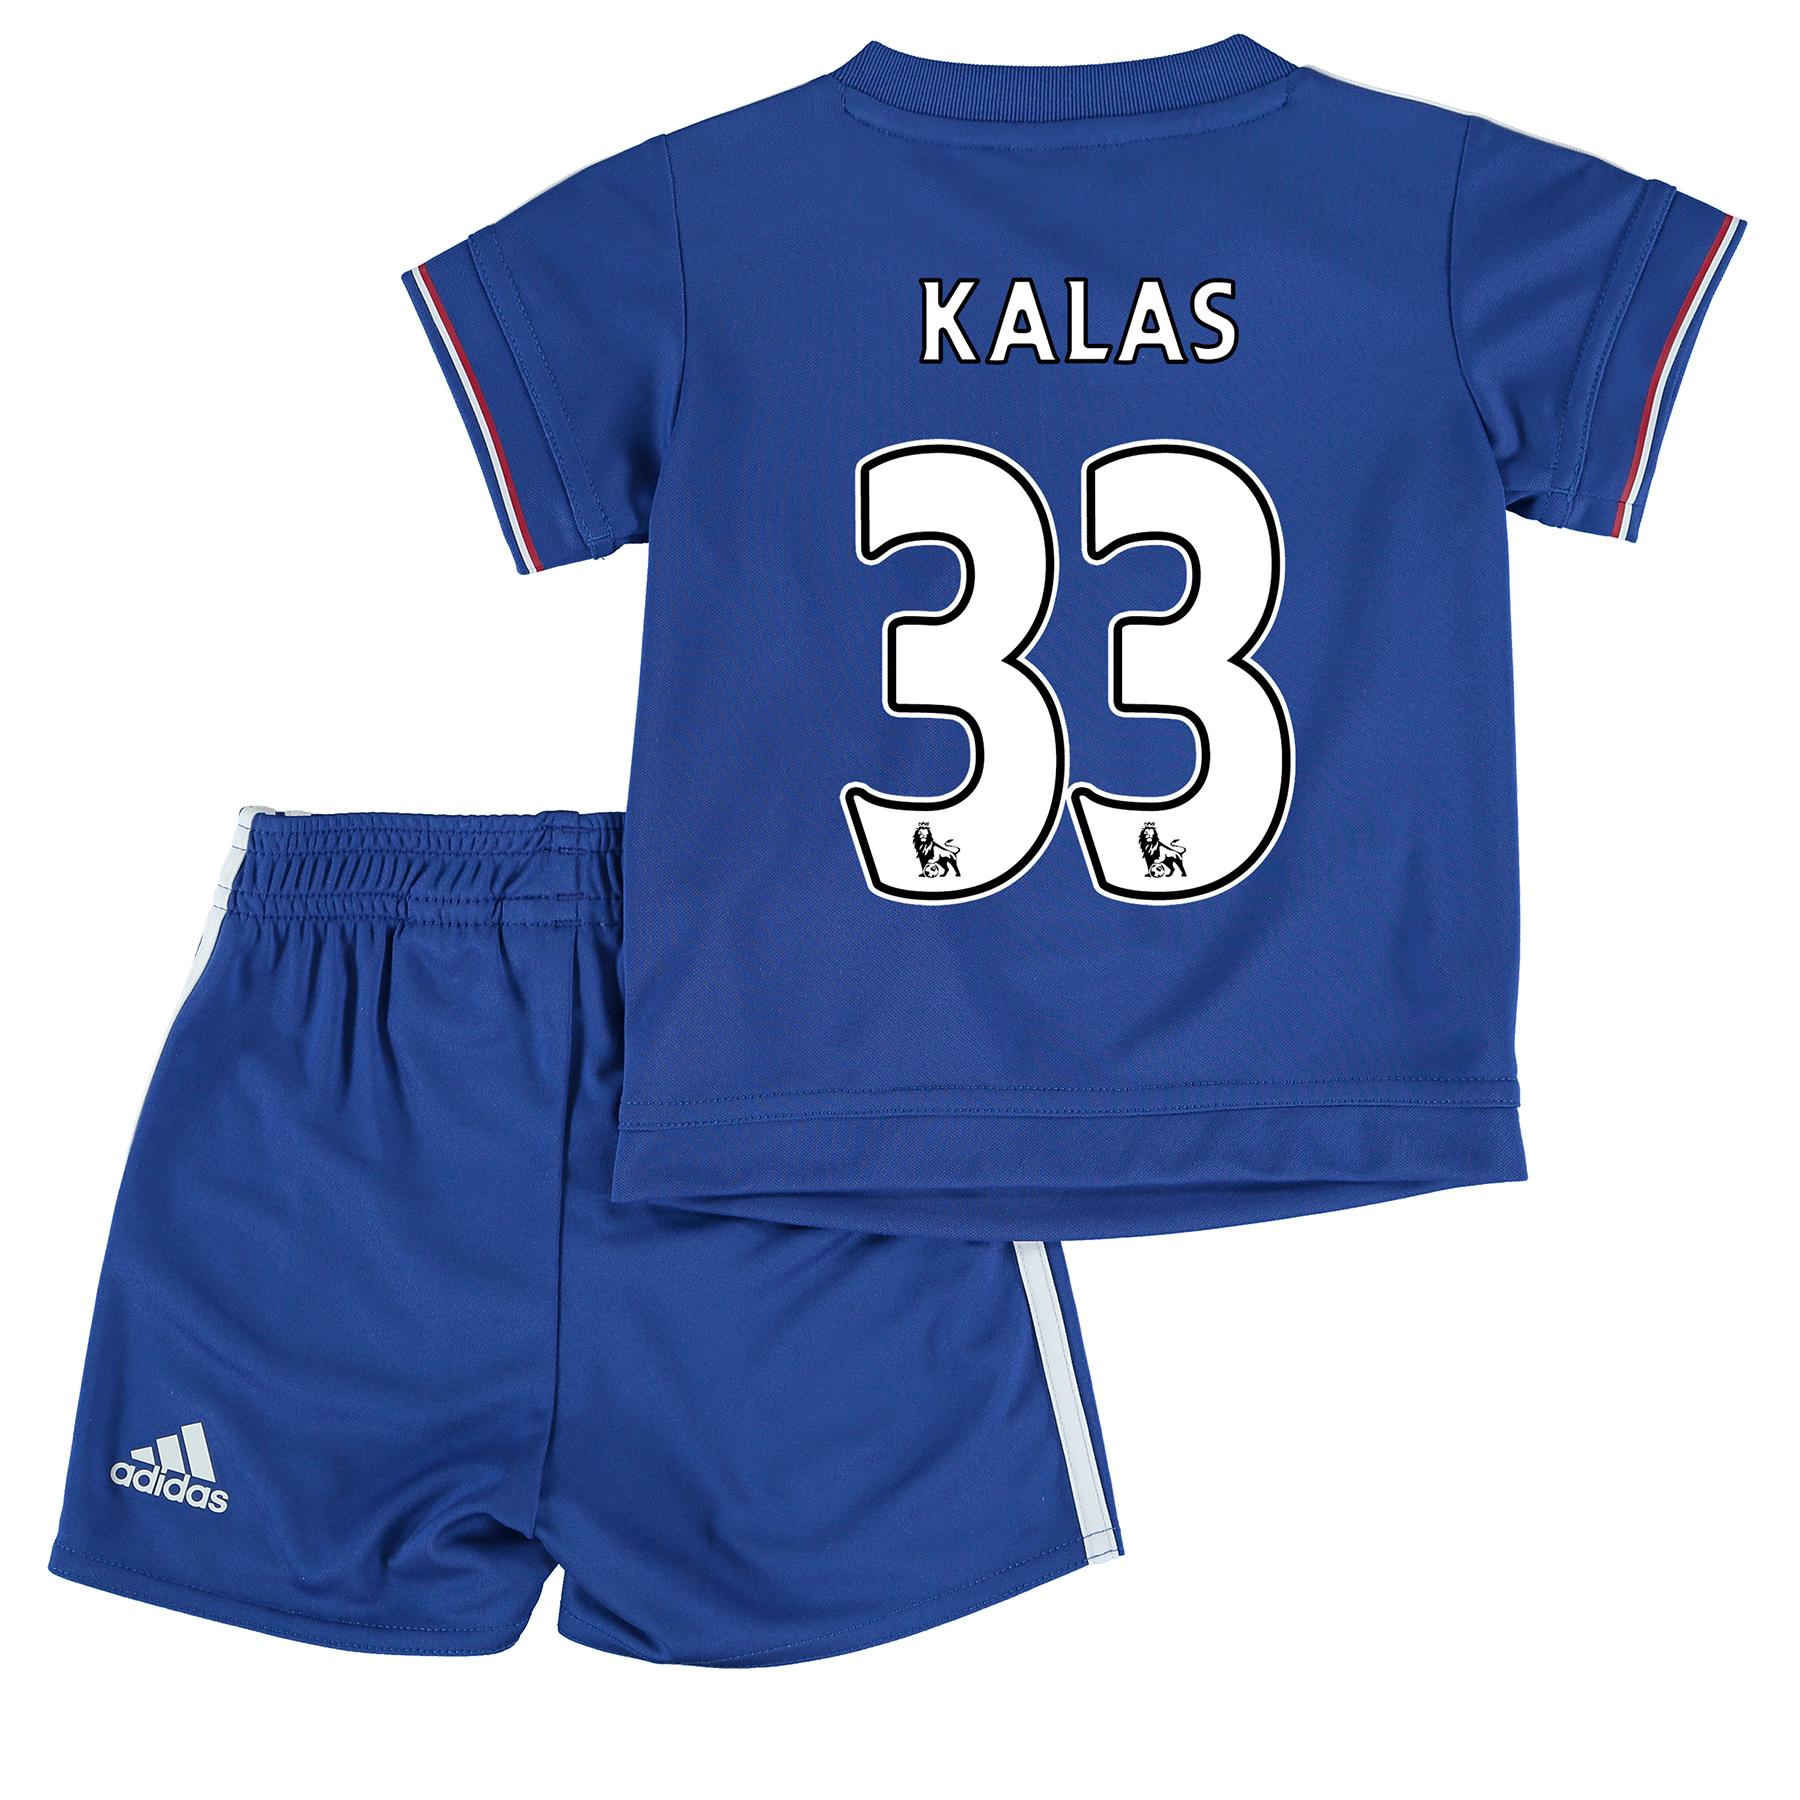 Chelsea Home Mini Kit 2015/16 Blue with Kalas 33 printing